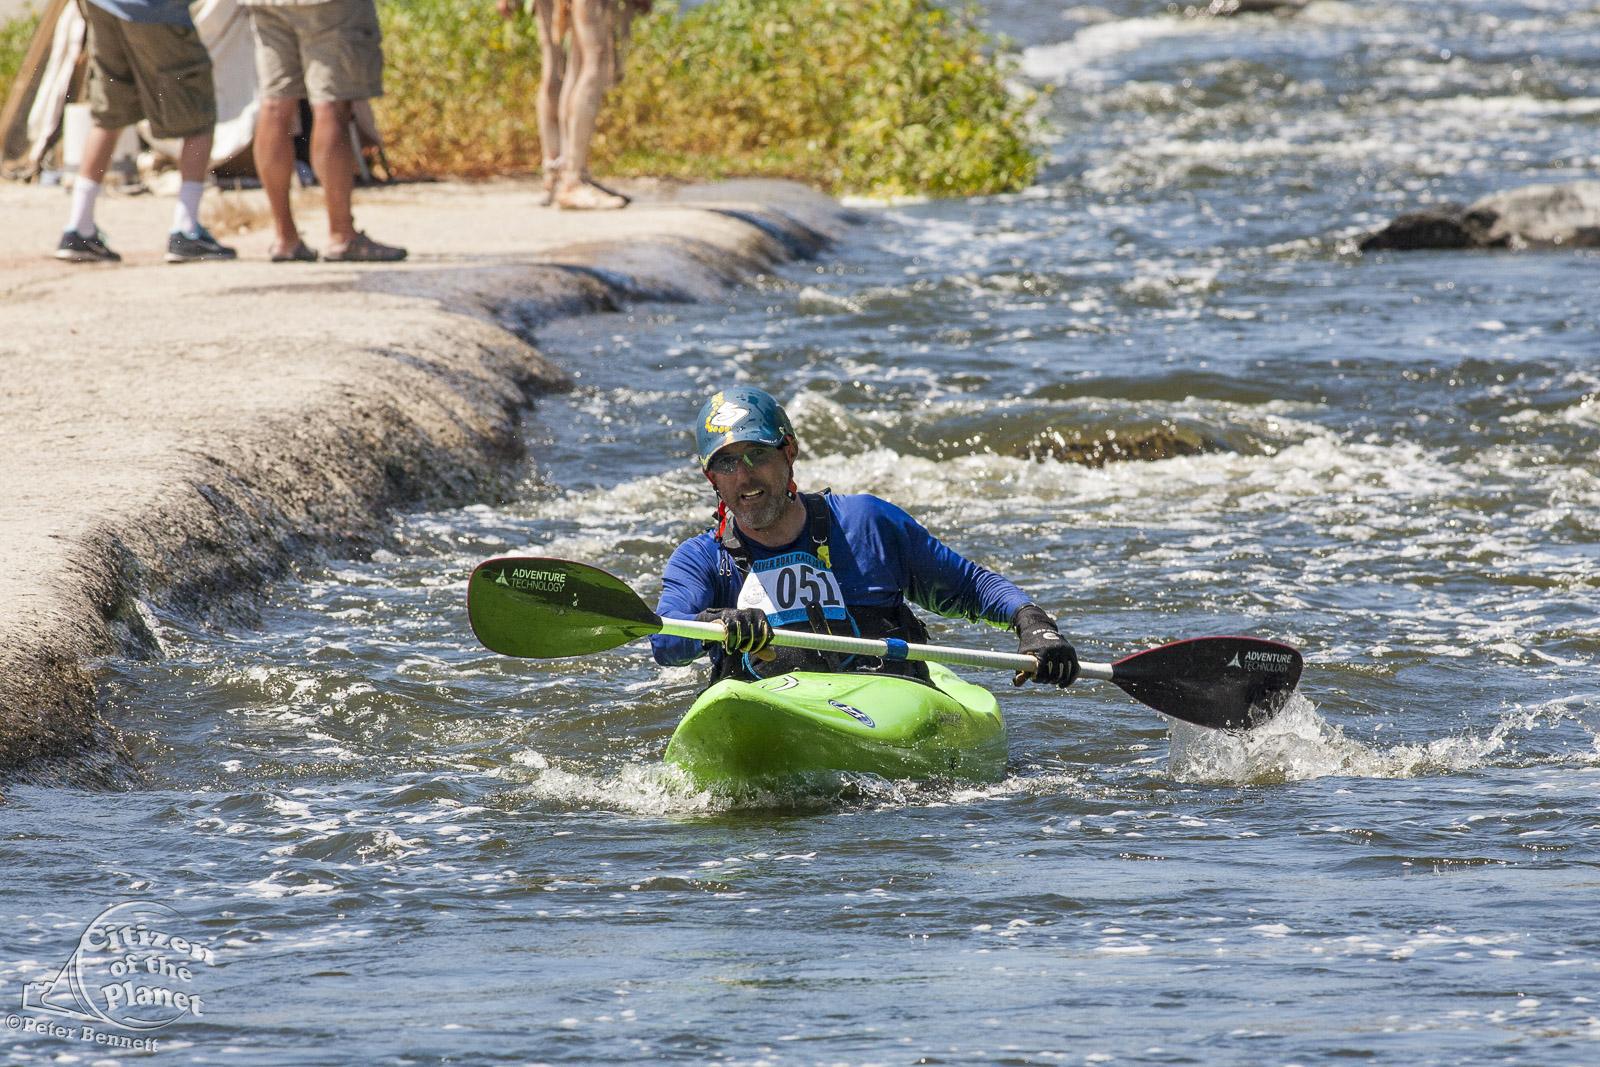 US_CA_48_3841_la_river_boat_race.jpg